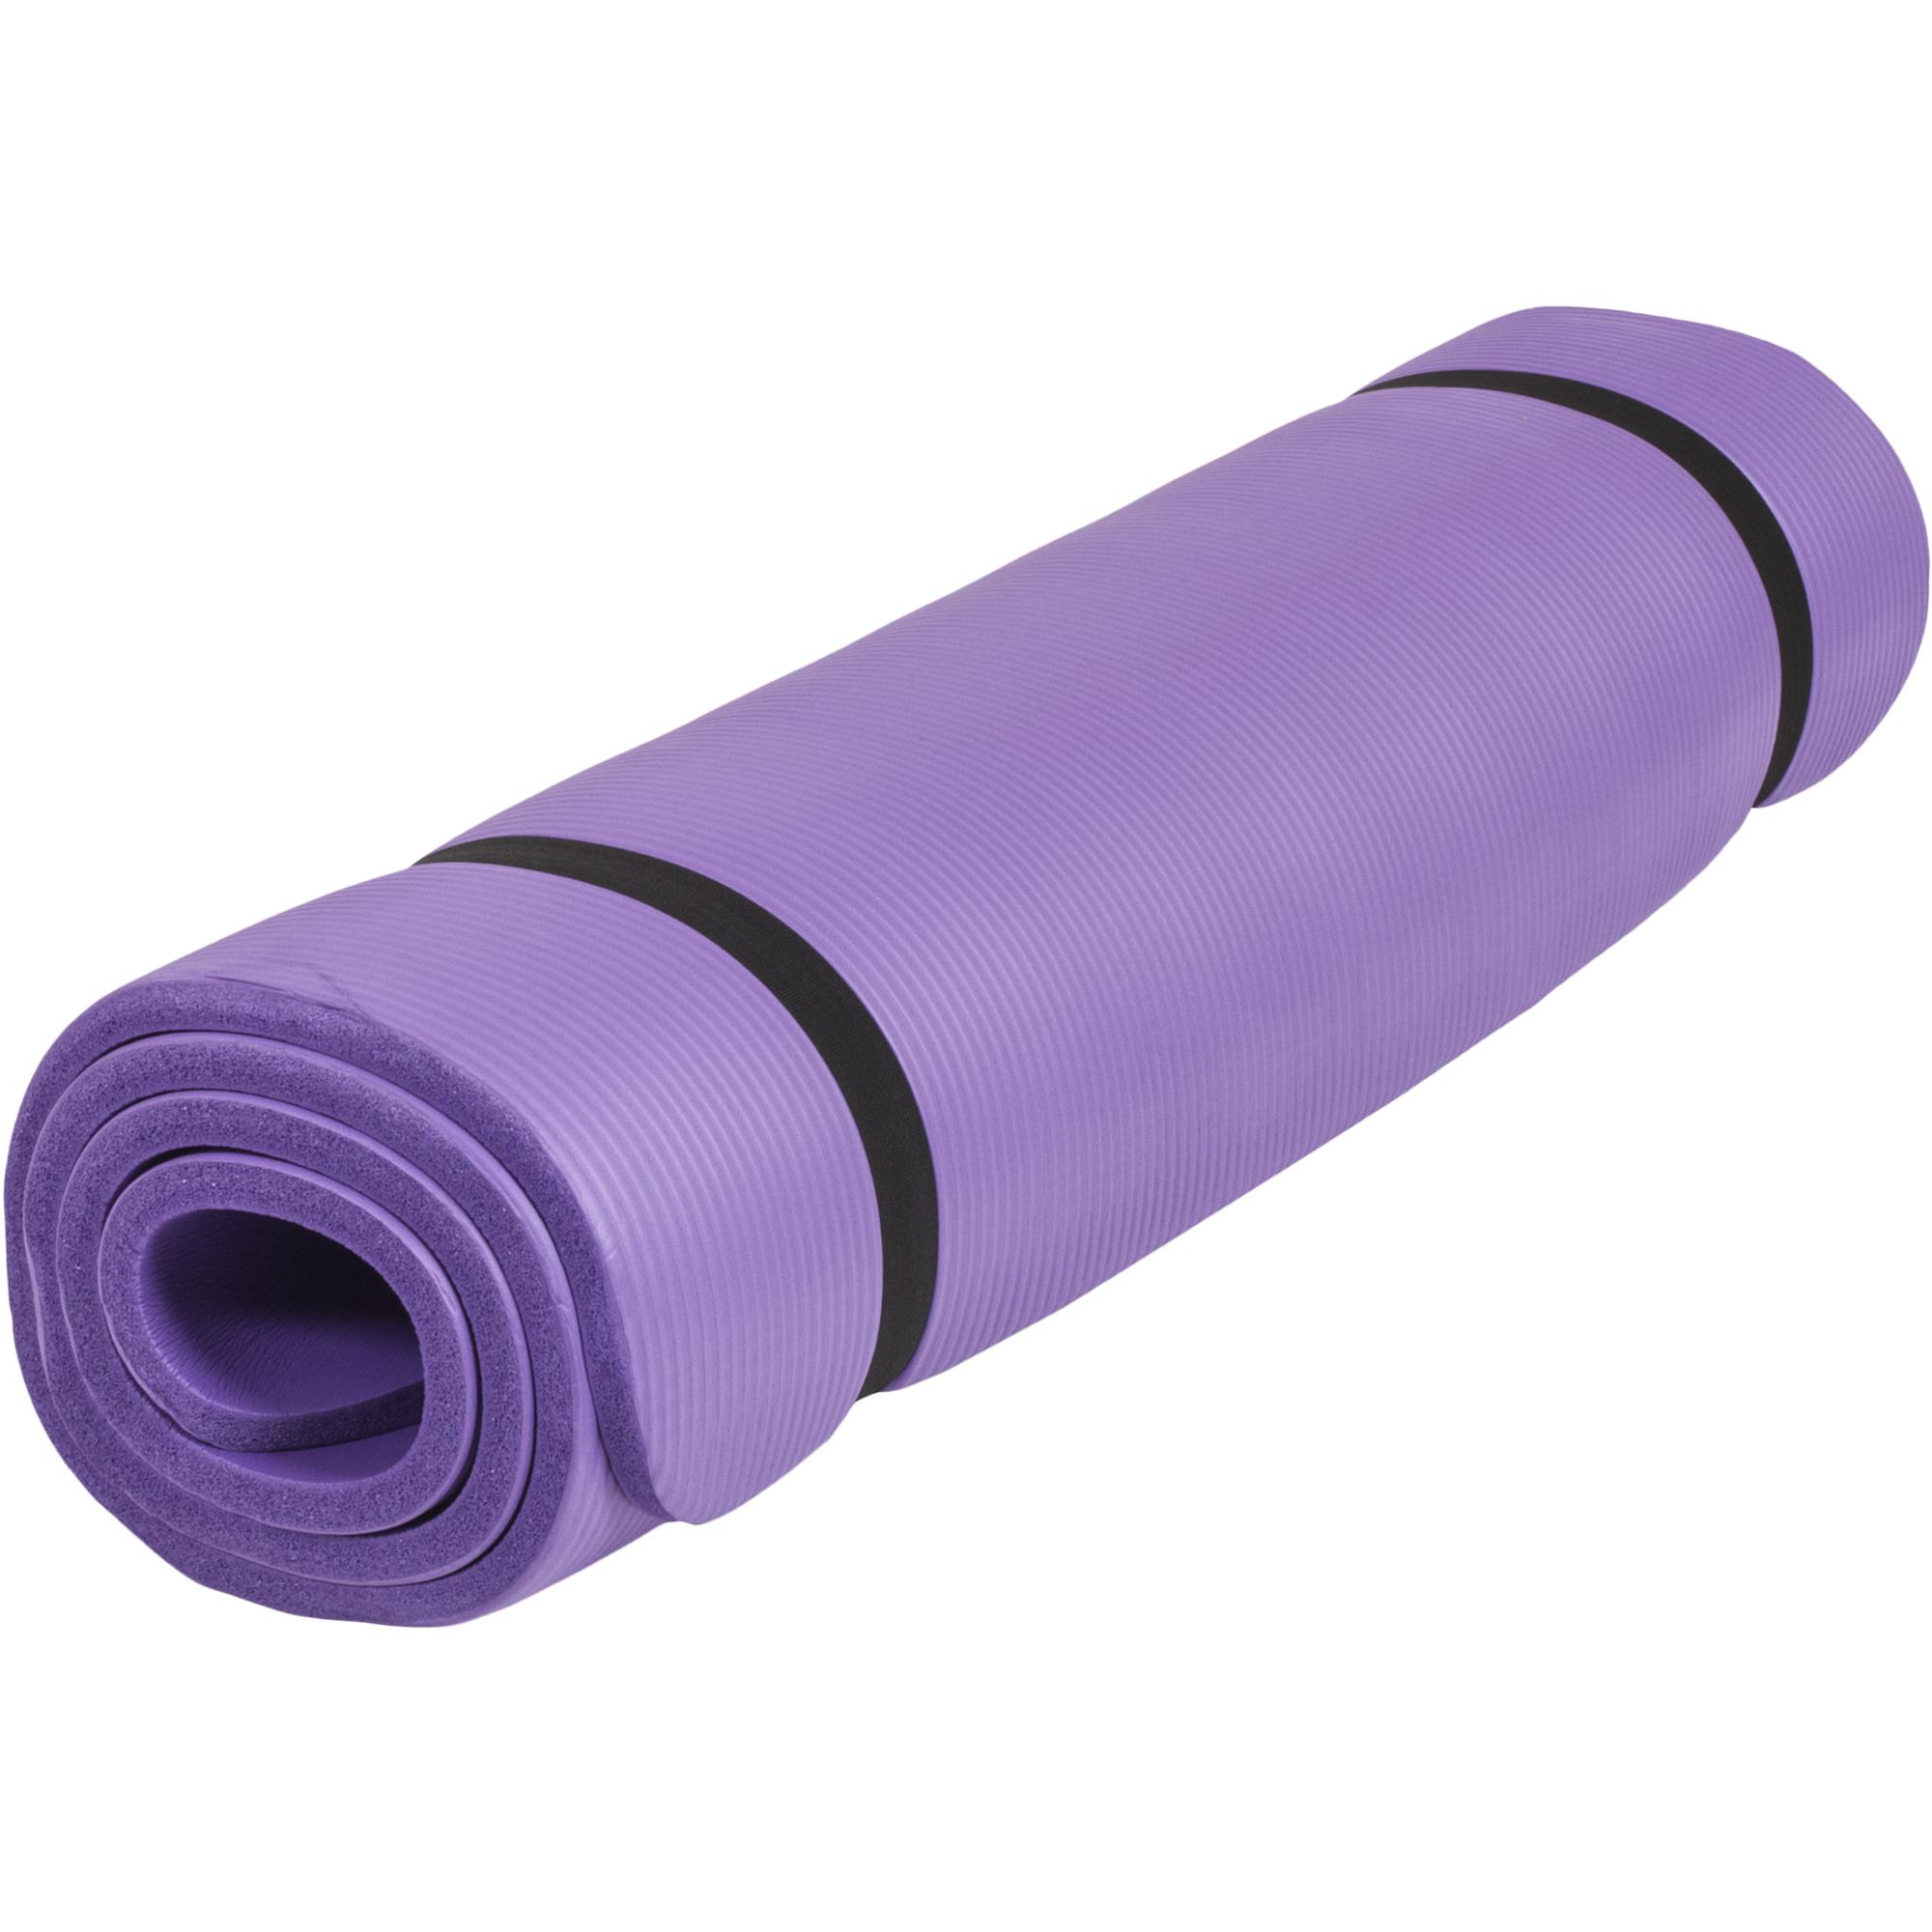 tapis en mousse pour le sport domicile violet tapisvioletxl. Black Bedroom Furniture Sets. Home Design Ideas